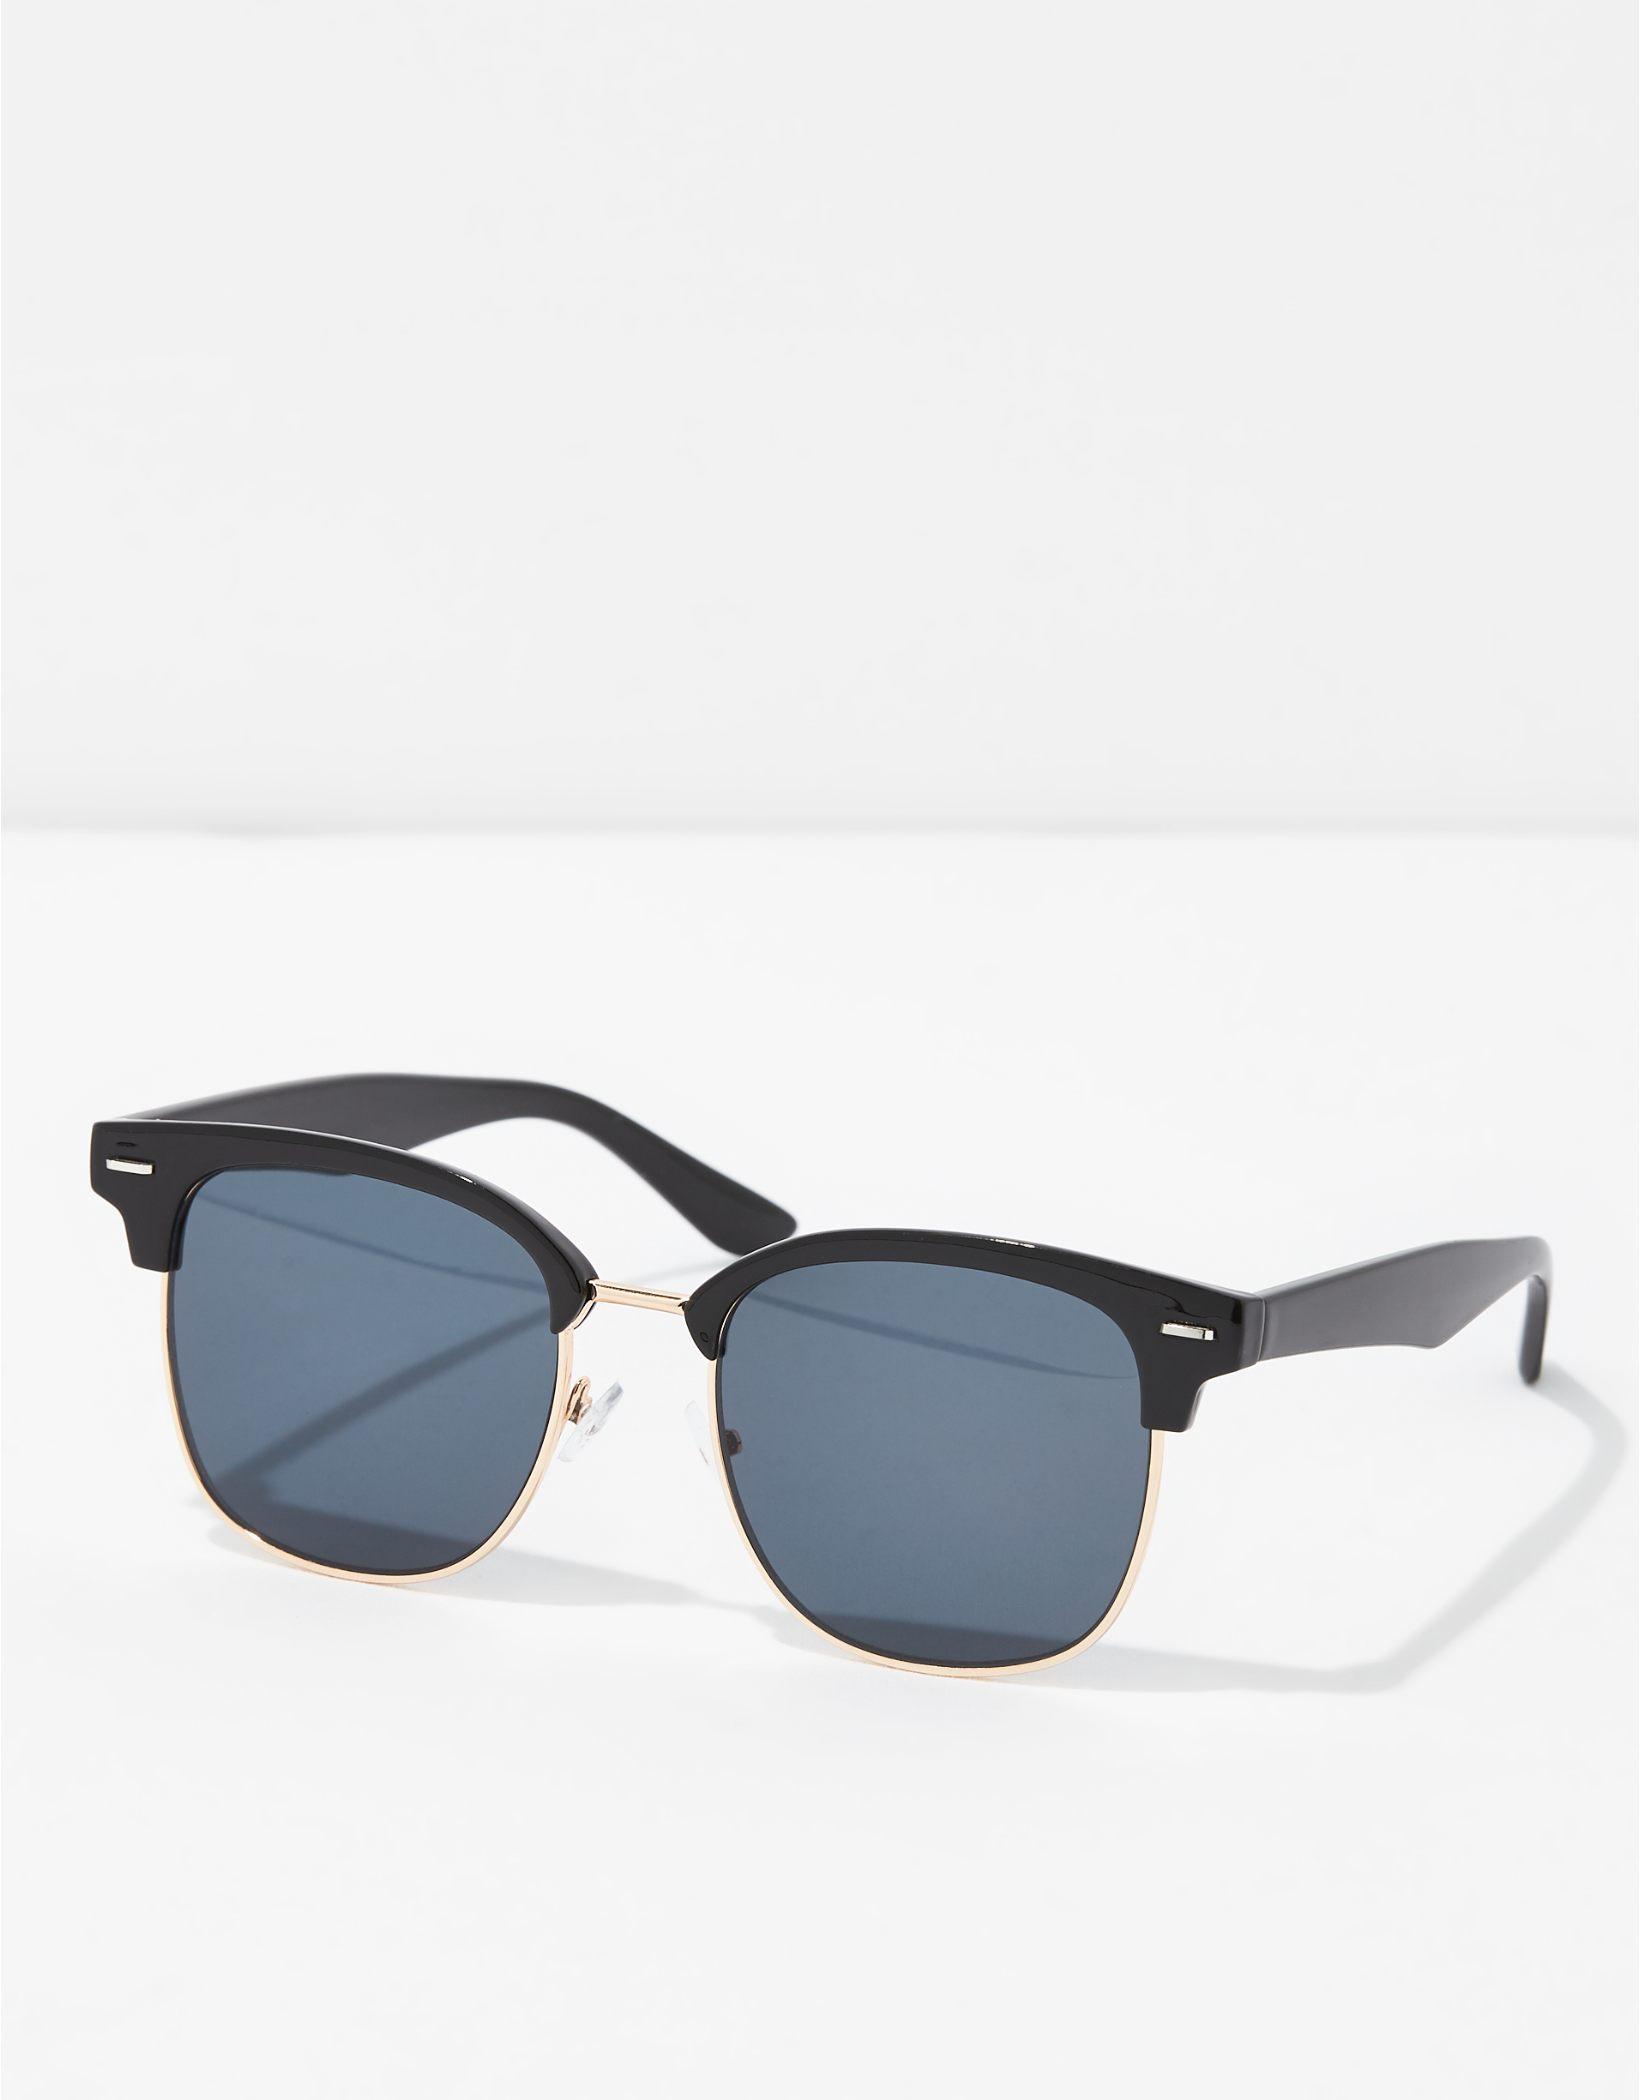 AEO Clubmaster Sunglasses